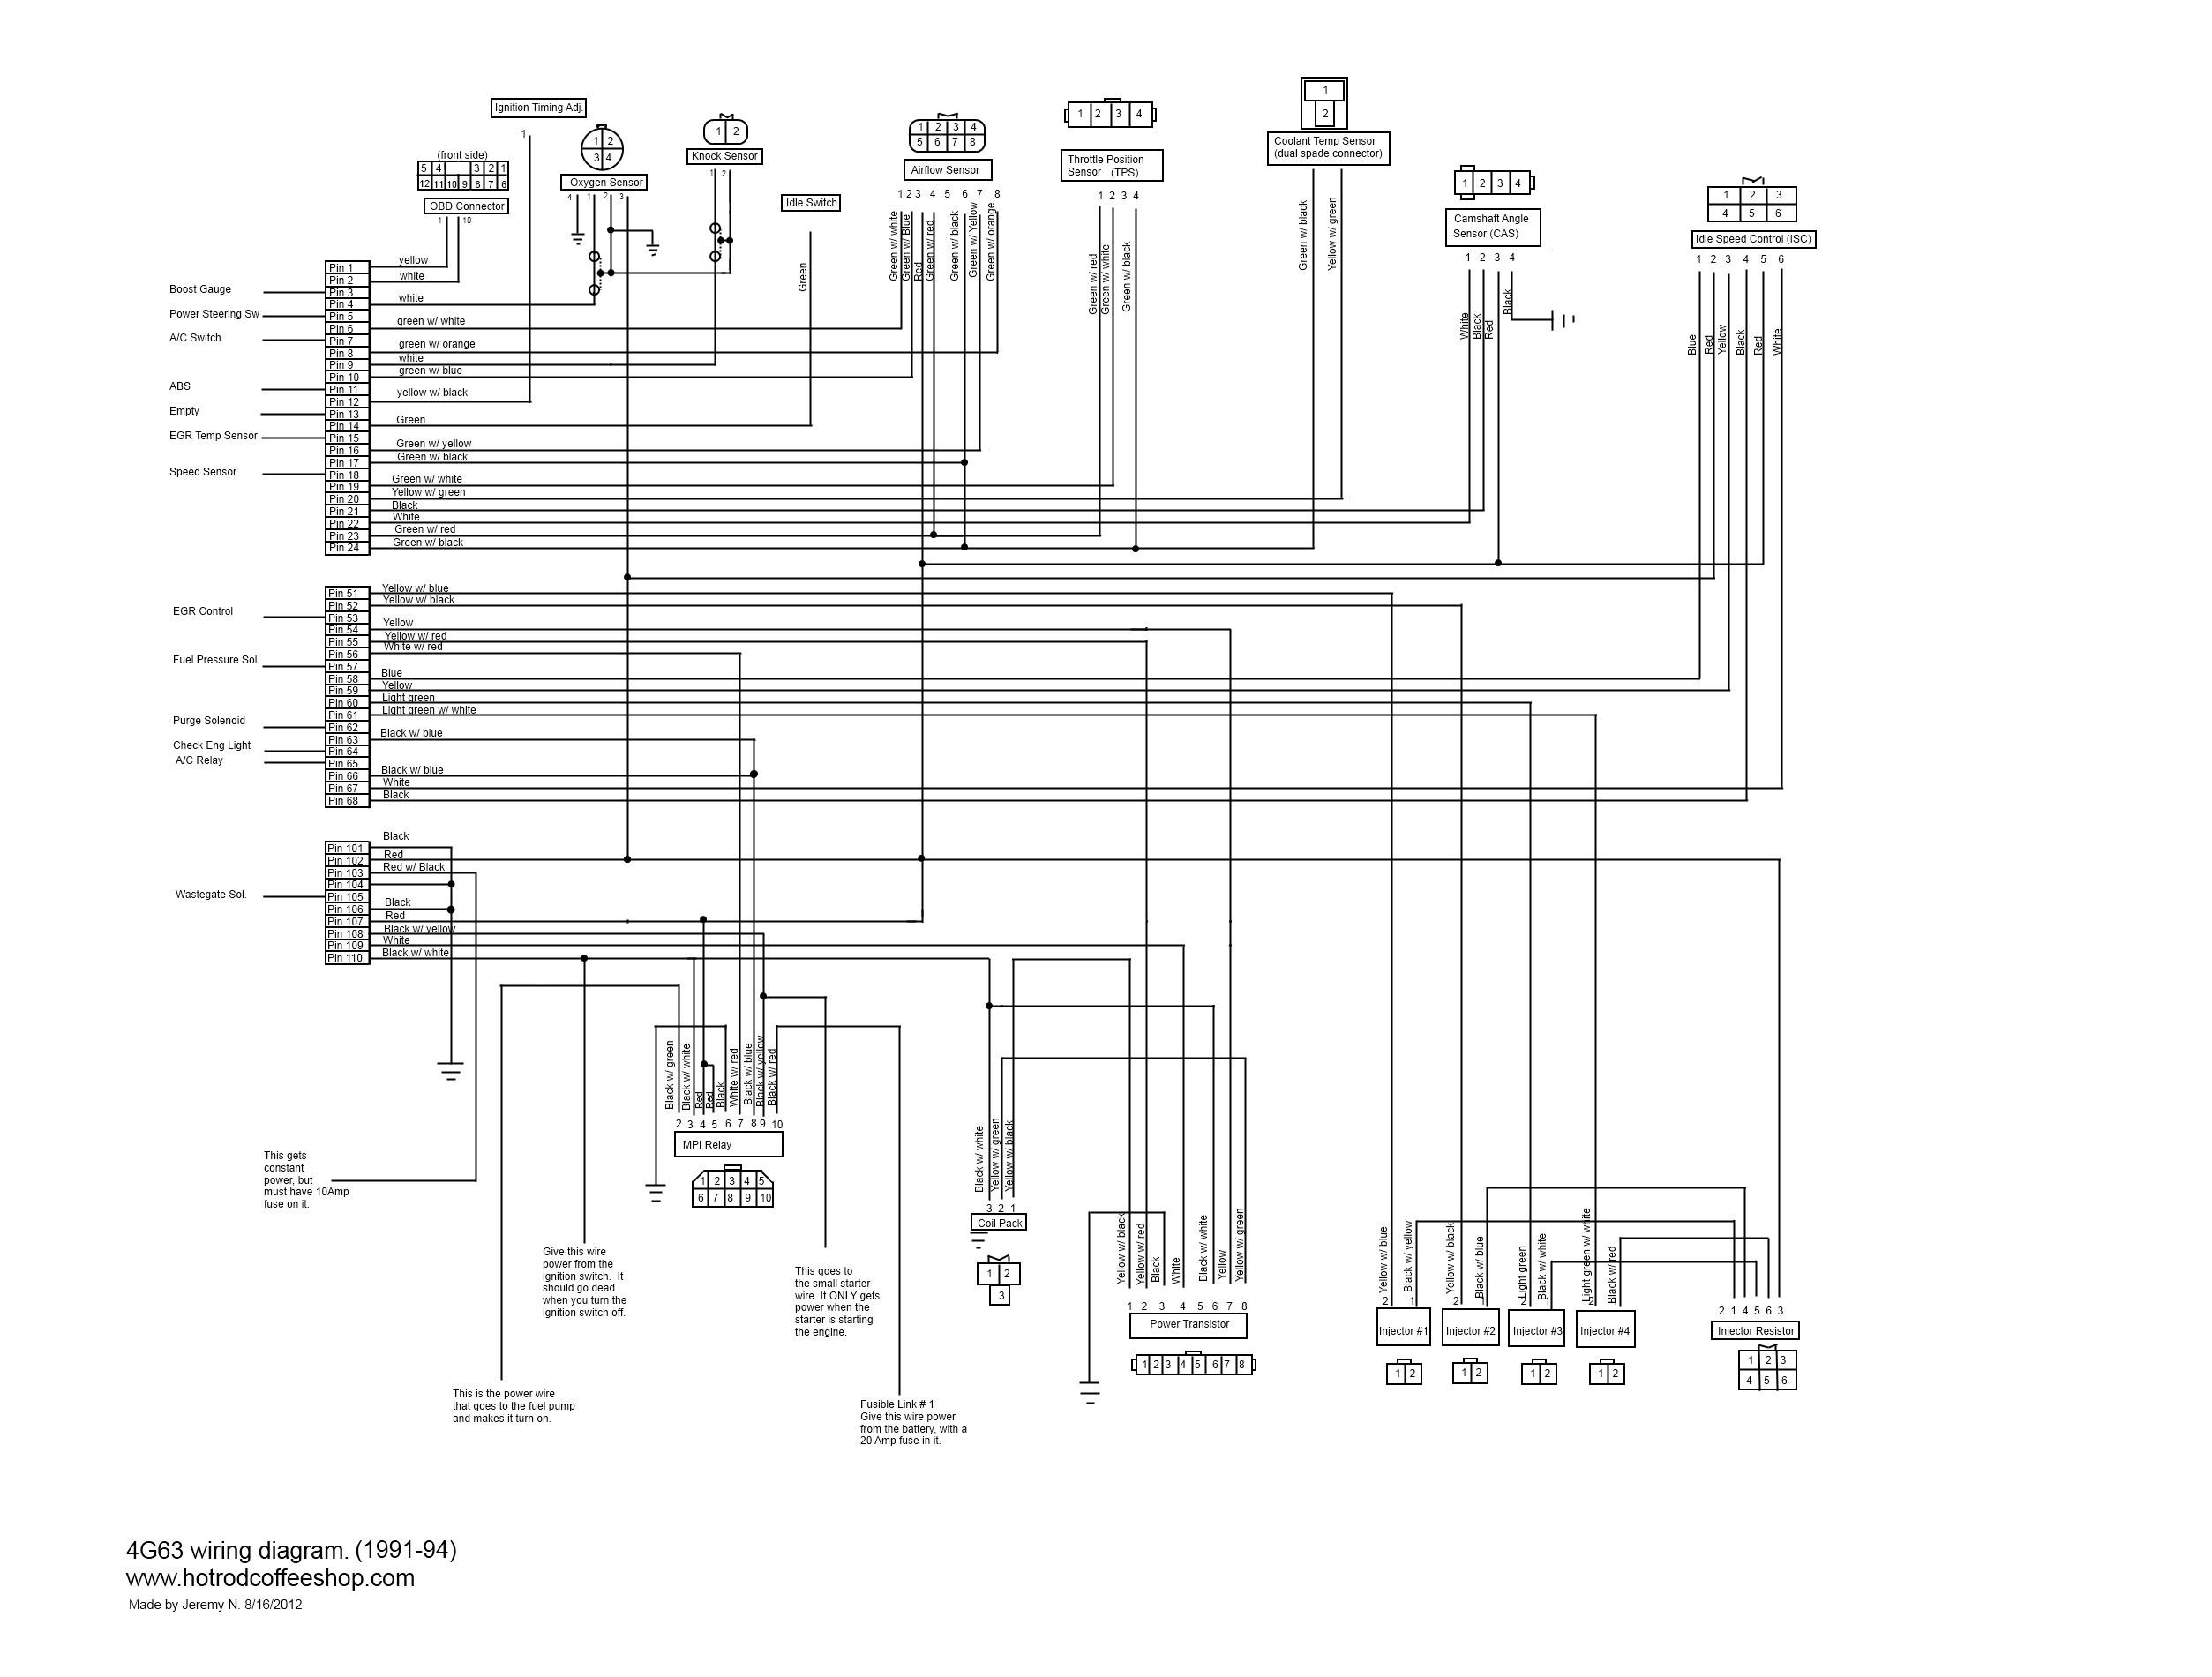 2002 Mitsubishi Diamante Engine Diagram 4g63 Wiring Diagrams Schematics for Engine Swaps Of 2002 Mitsubishi Diamante Engine Diagram